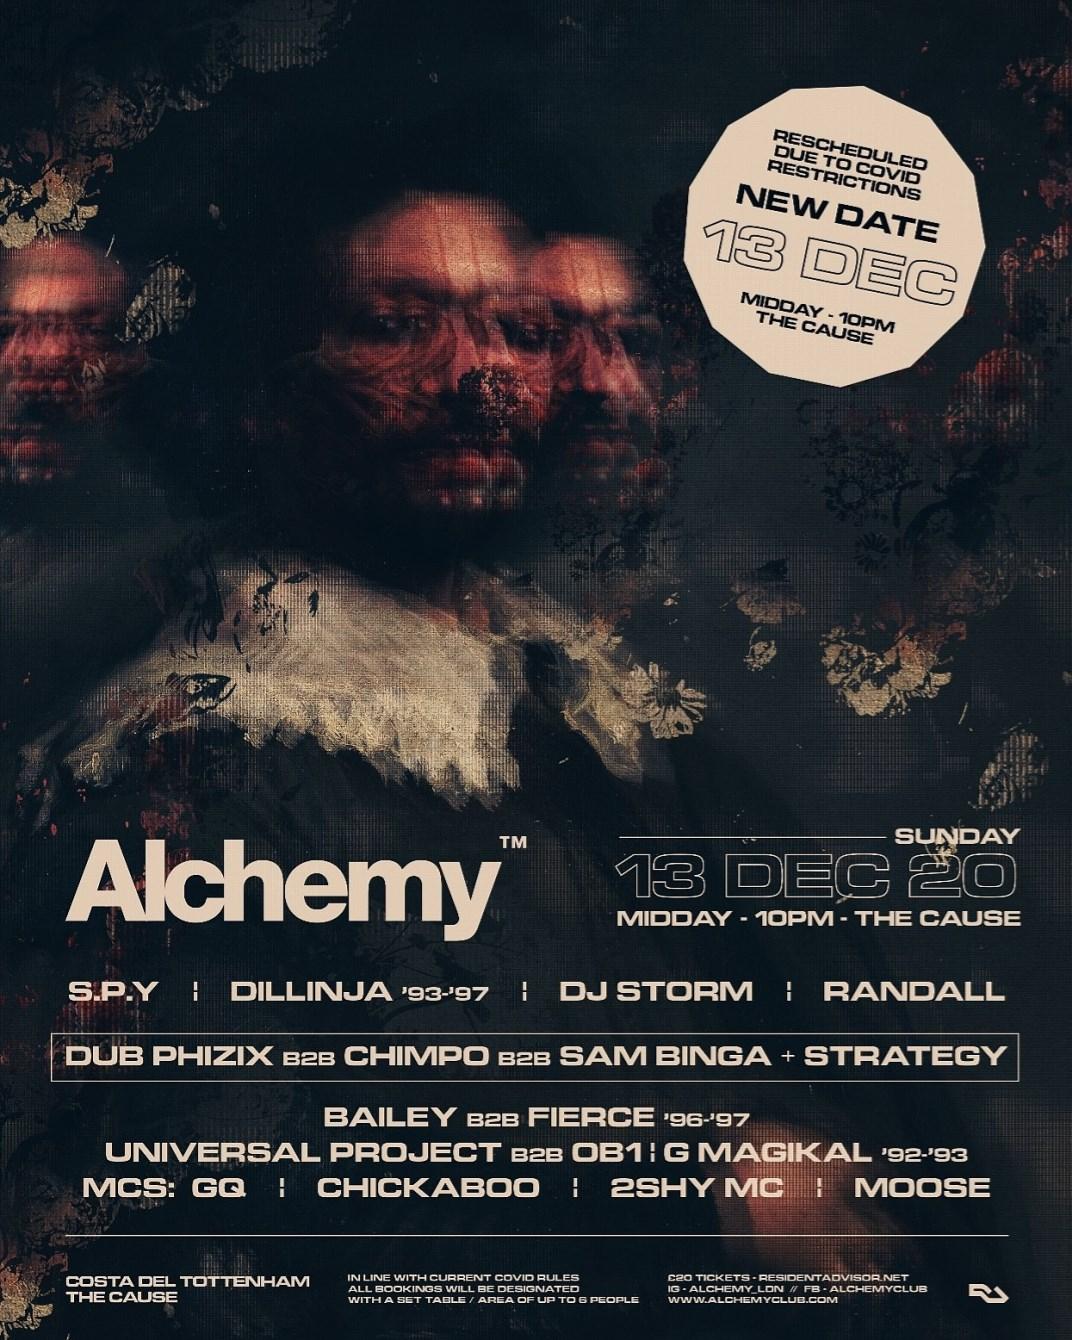 [RESCHEDULED] Alchemy ft S.P.Y, Dillinja, Dub Phizix, Chimpo, Randall, DJ Storm, Bailey, Fierce - Flyer front